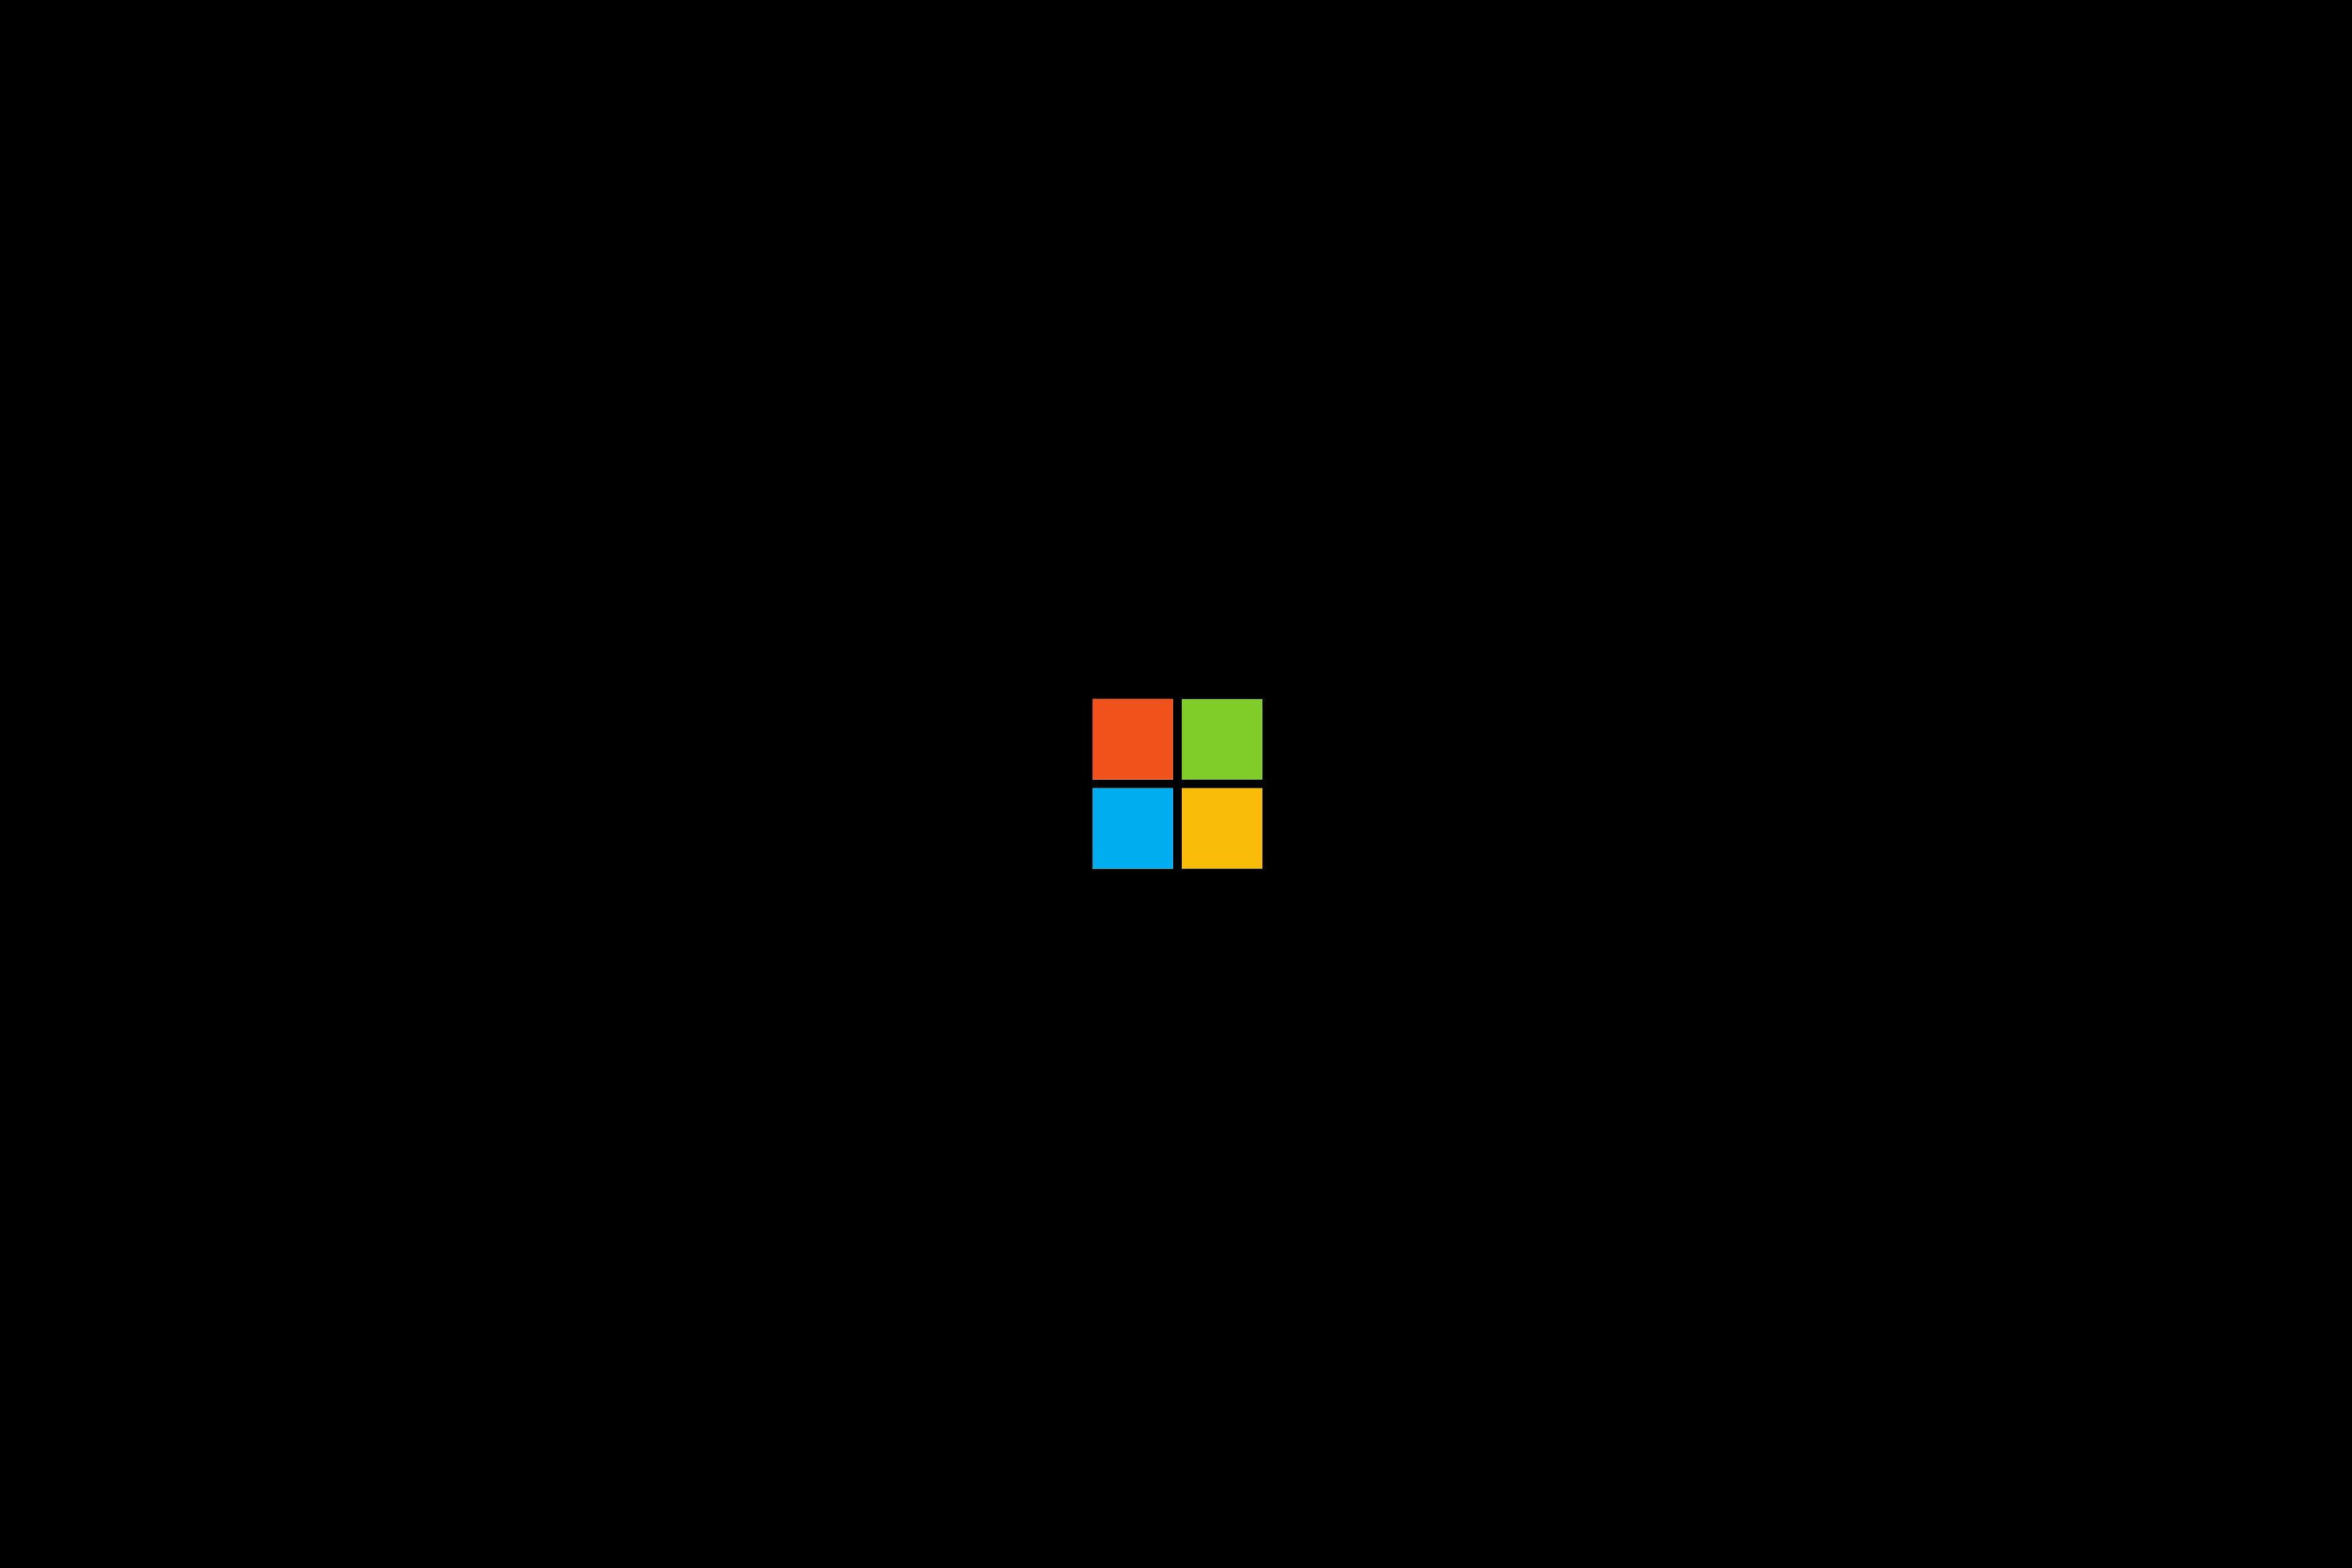 Wallpaper : Microsoft, brand, logo, minimalism 3240x2160 ...